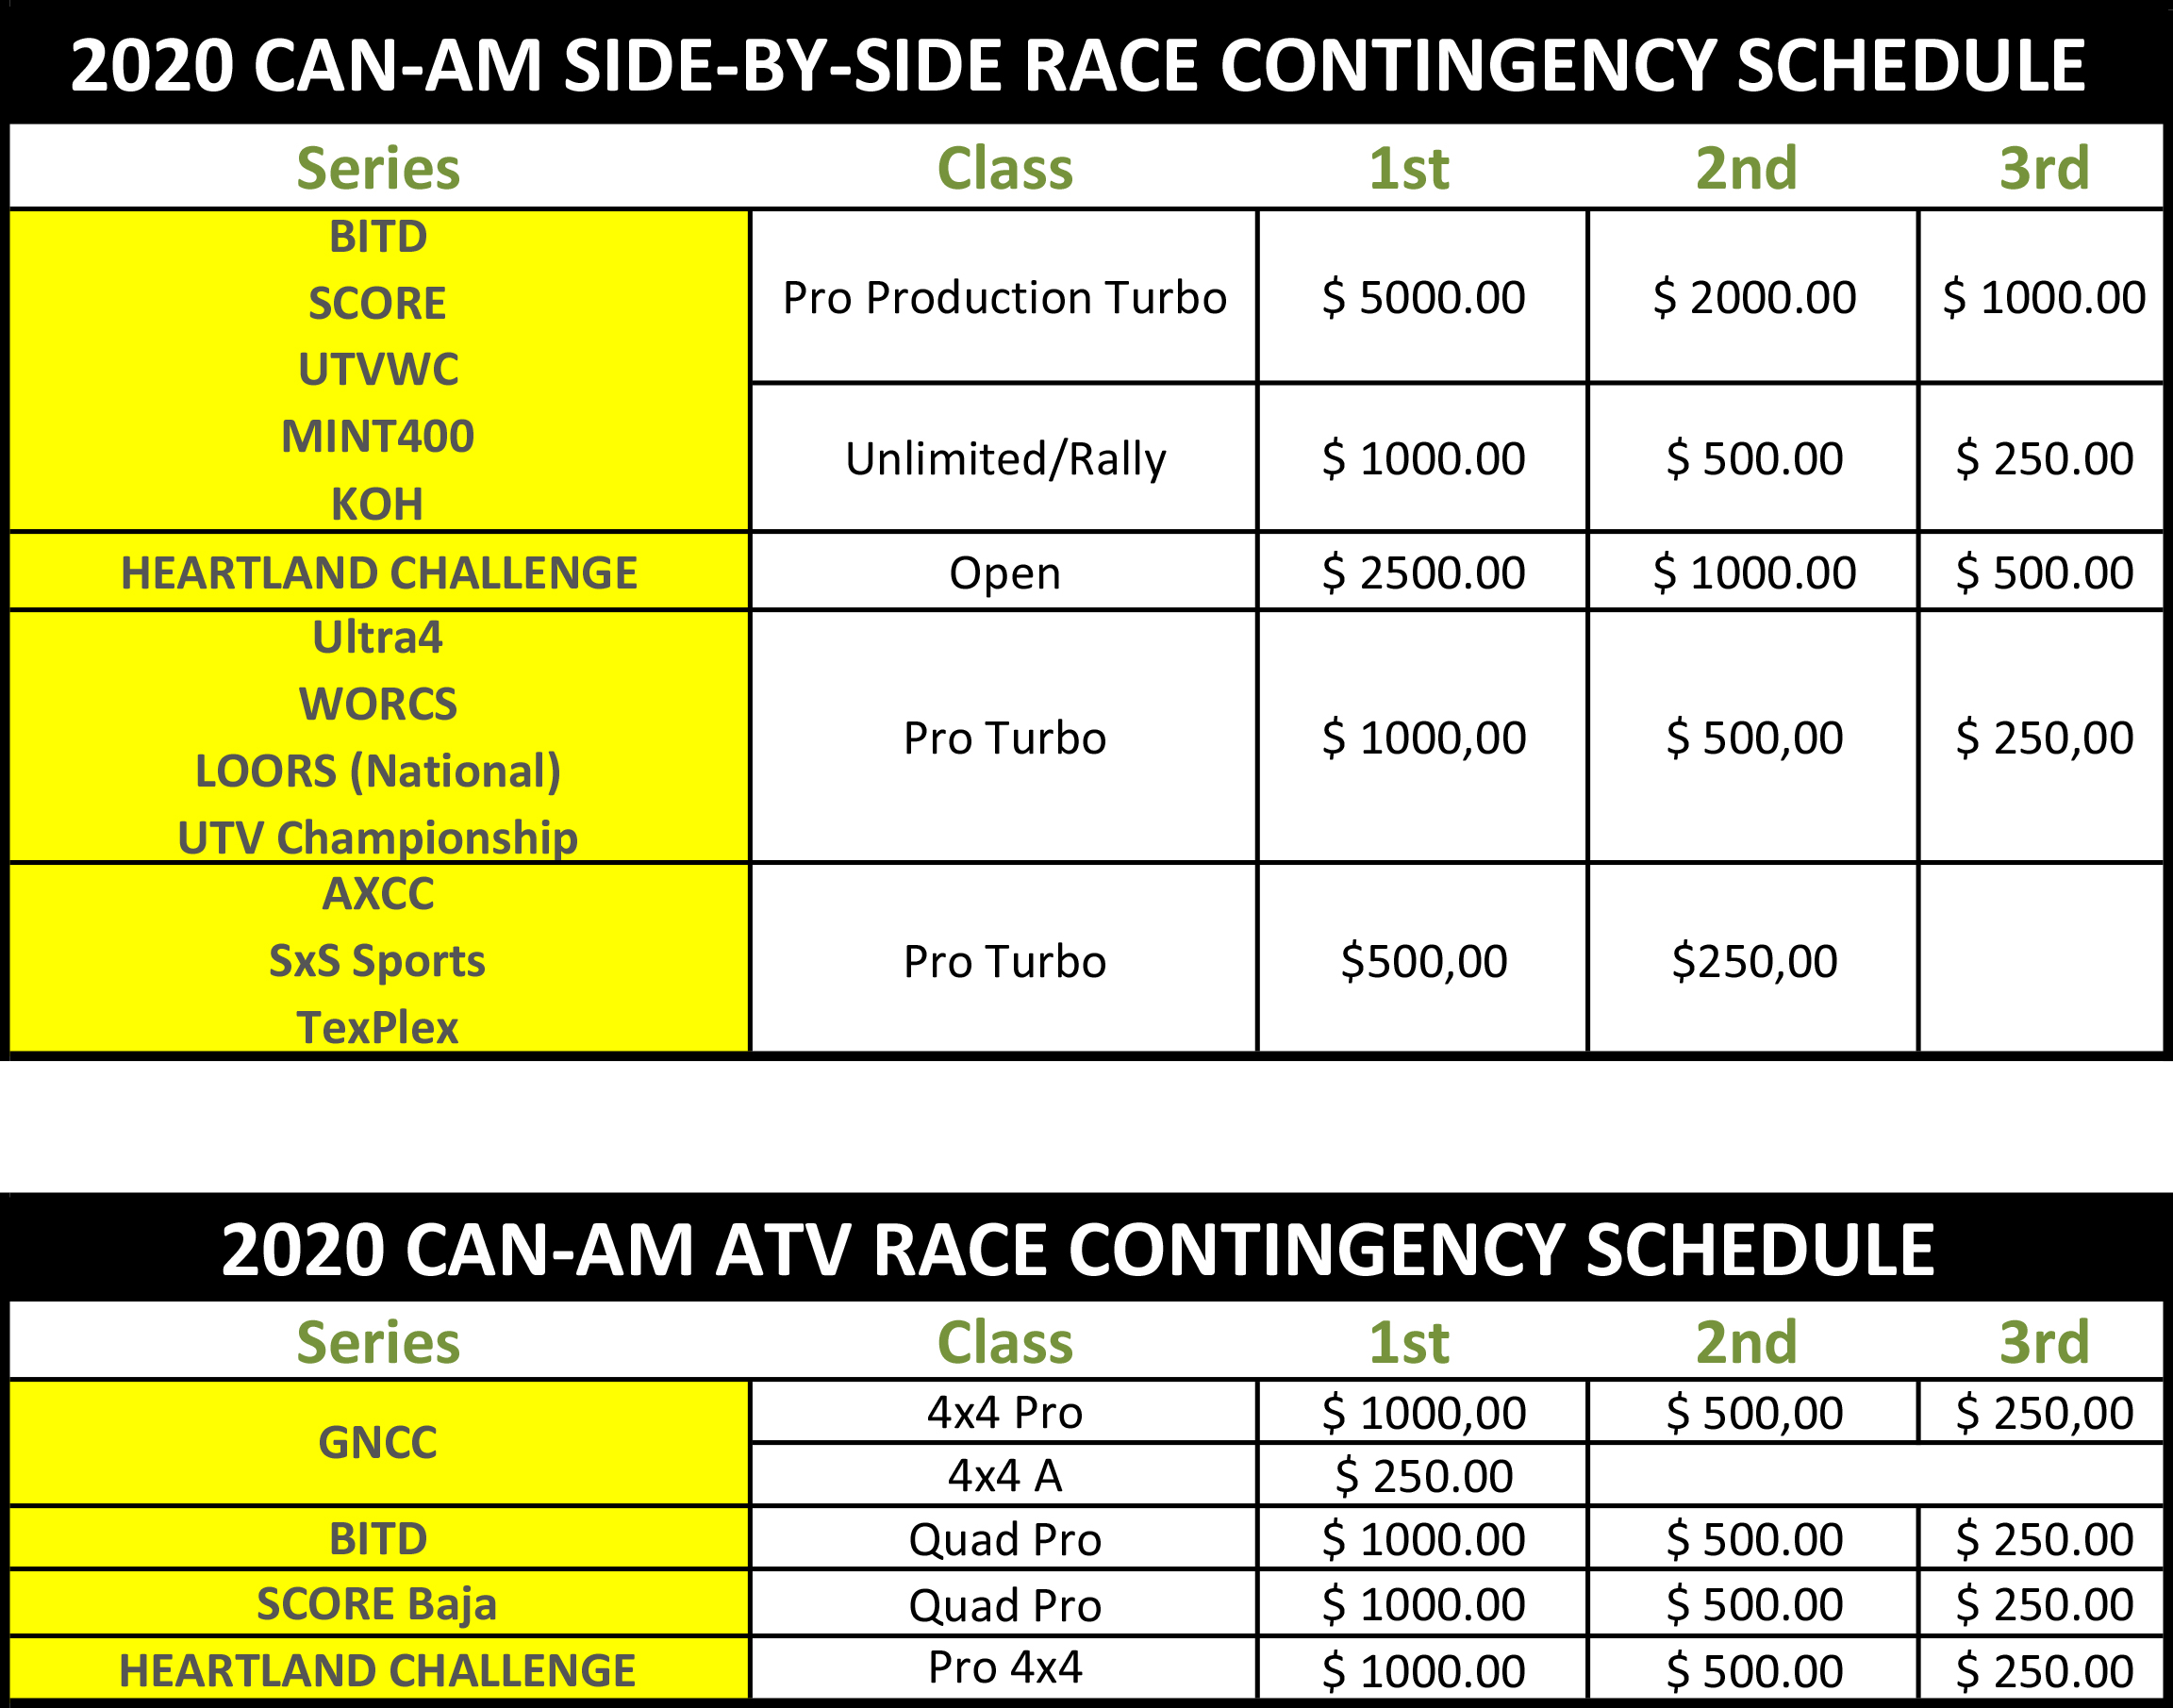 2020 Can-Am Off-Road Racing Contingency Program